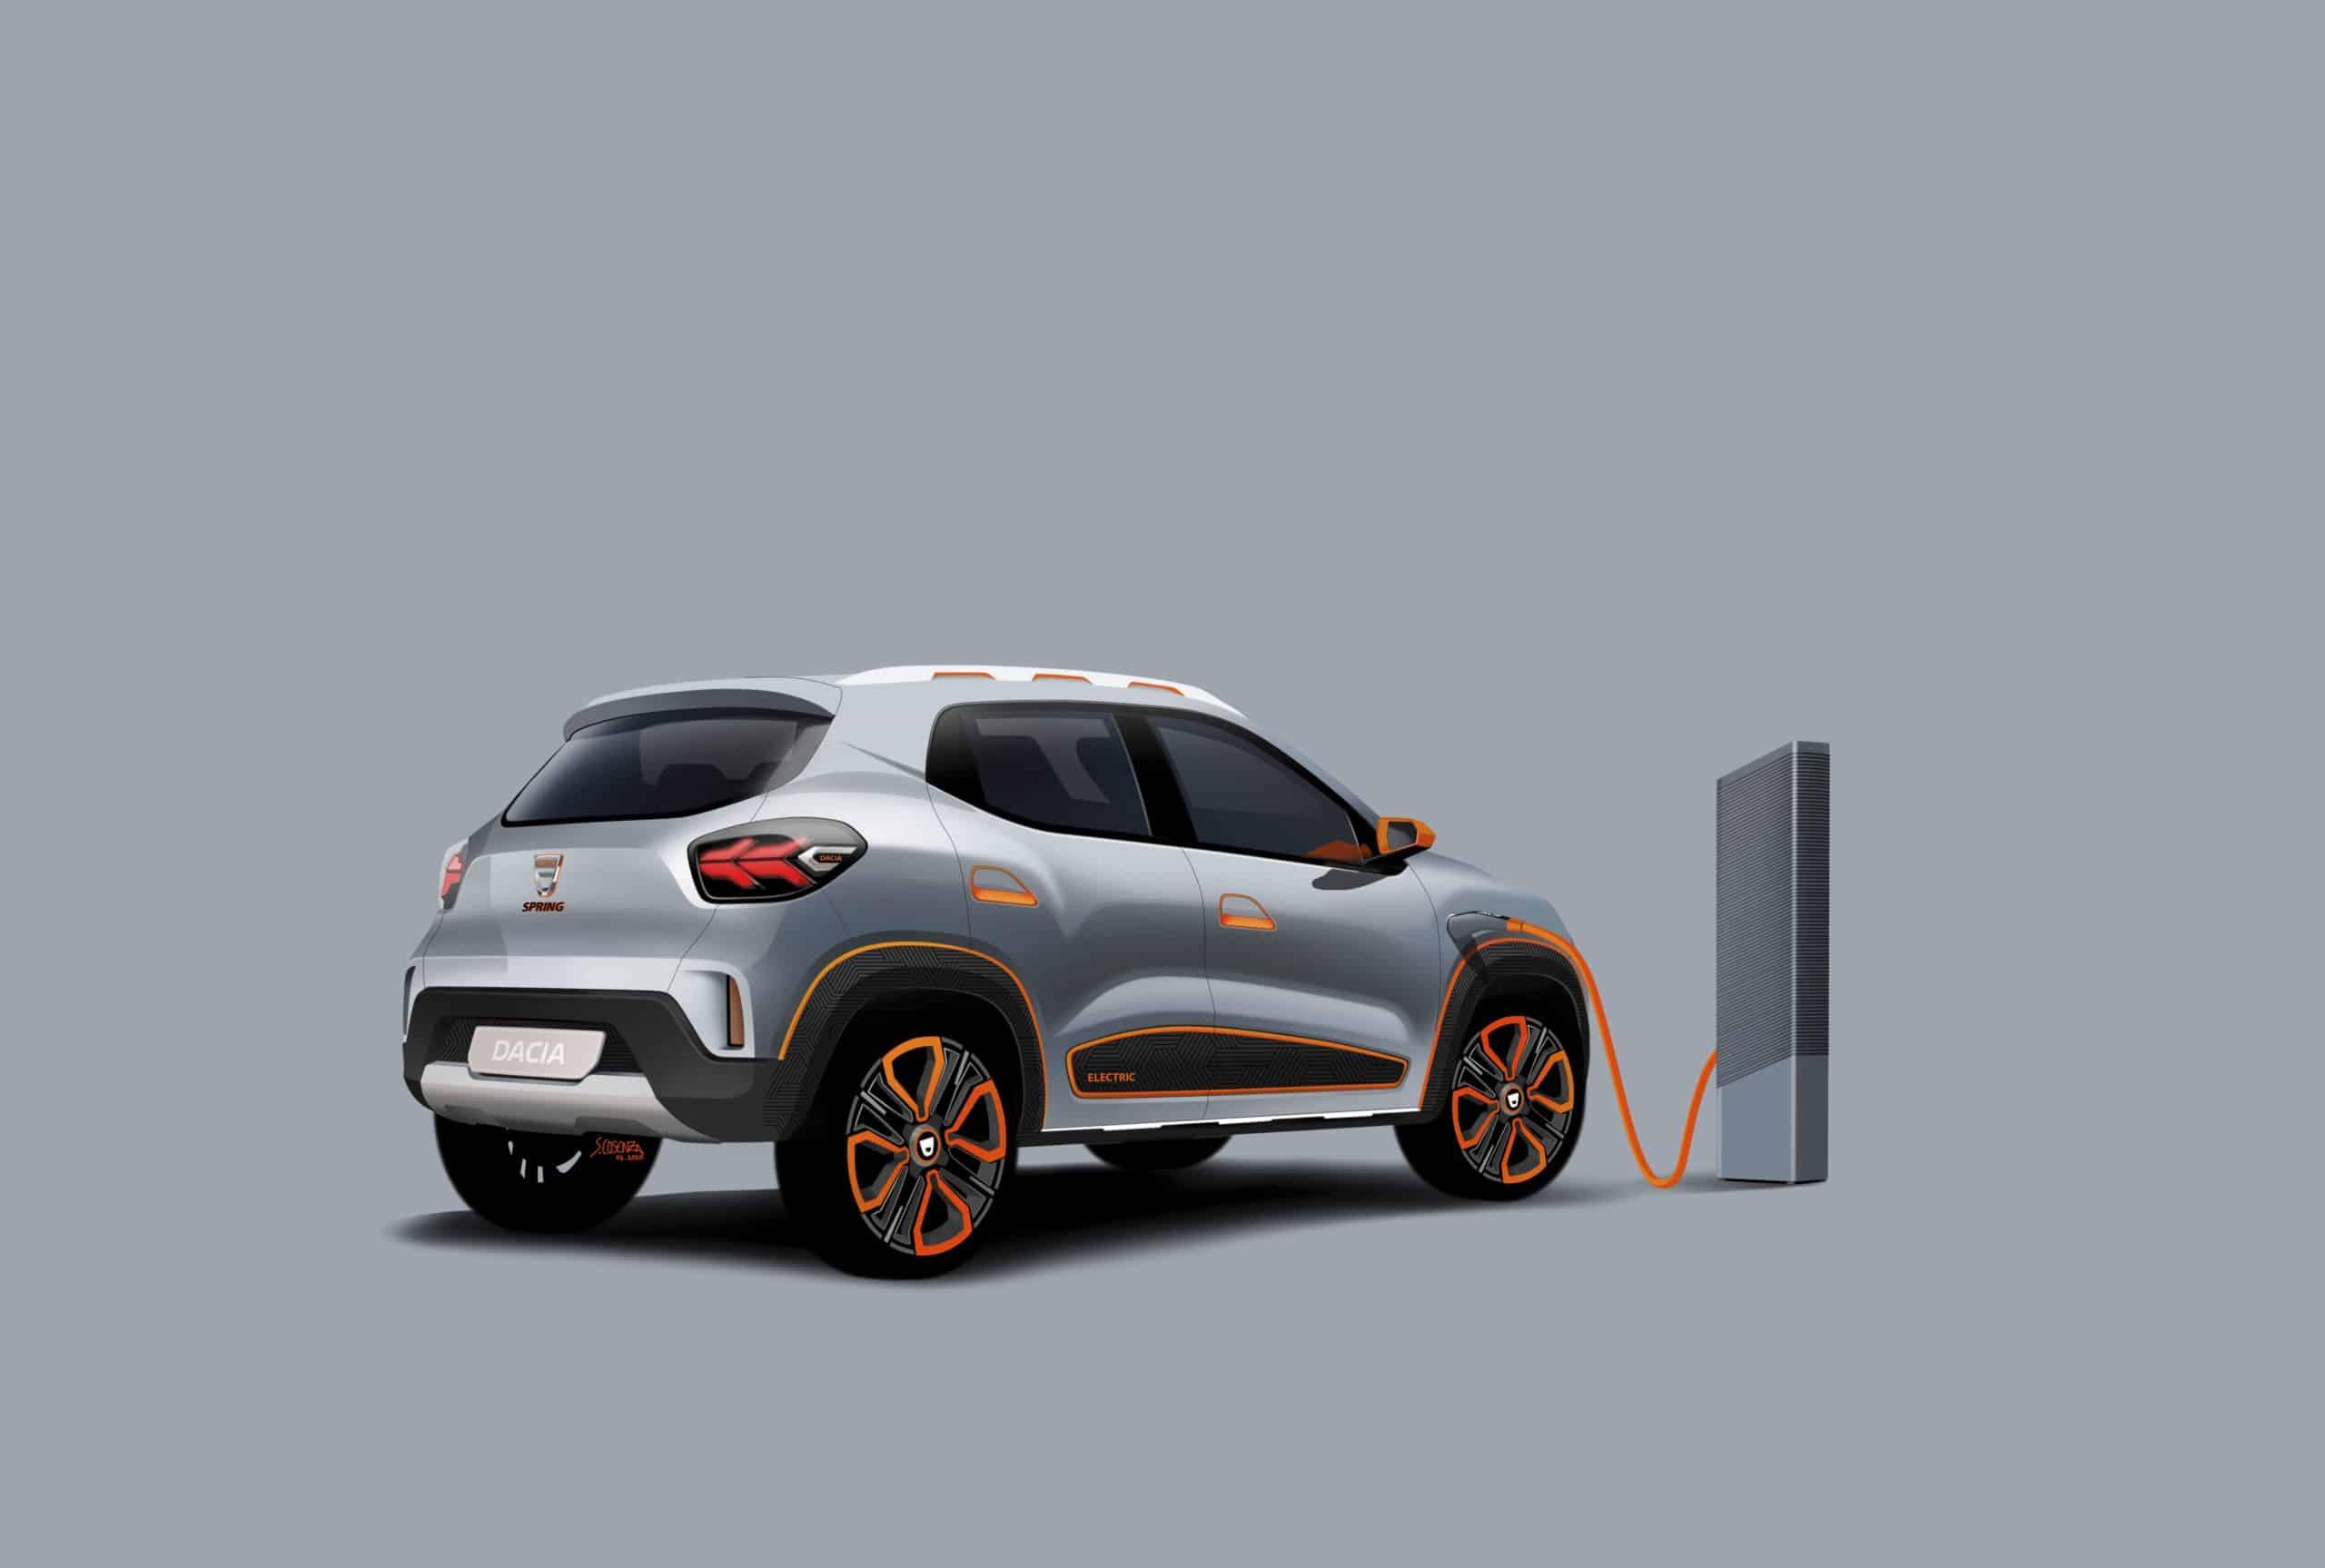 Dacia's erstes Elektroauto